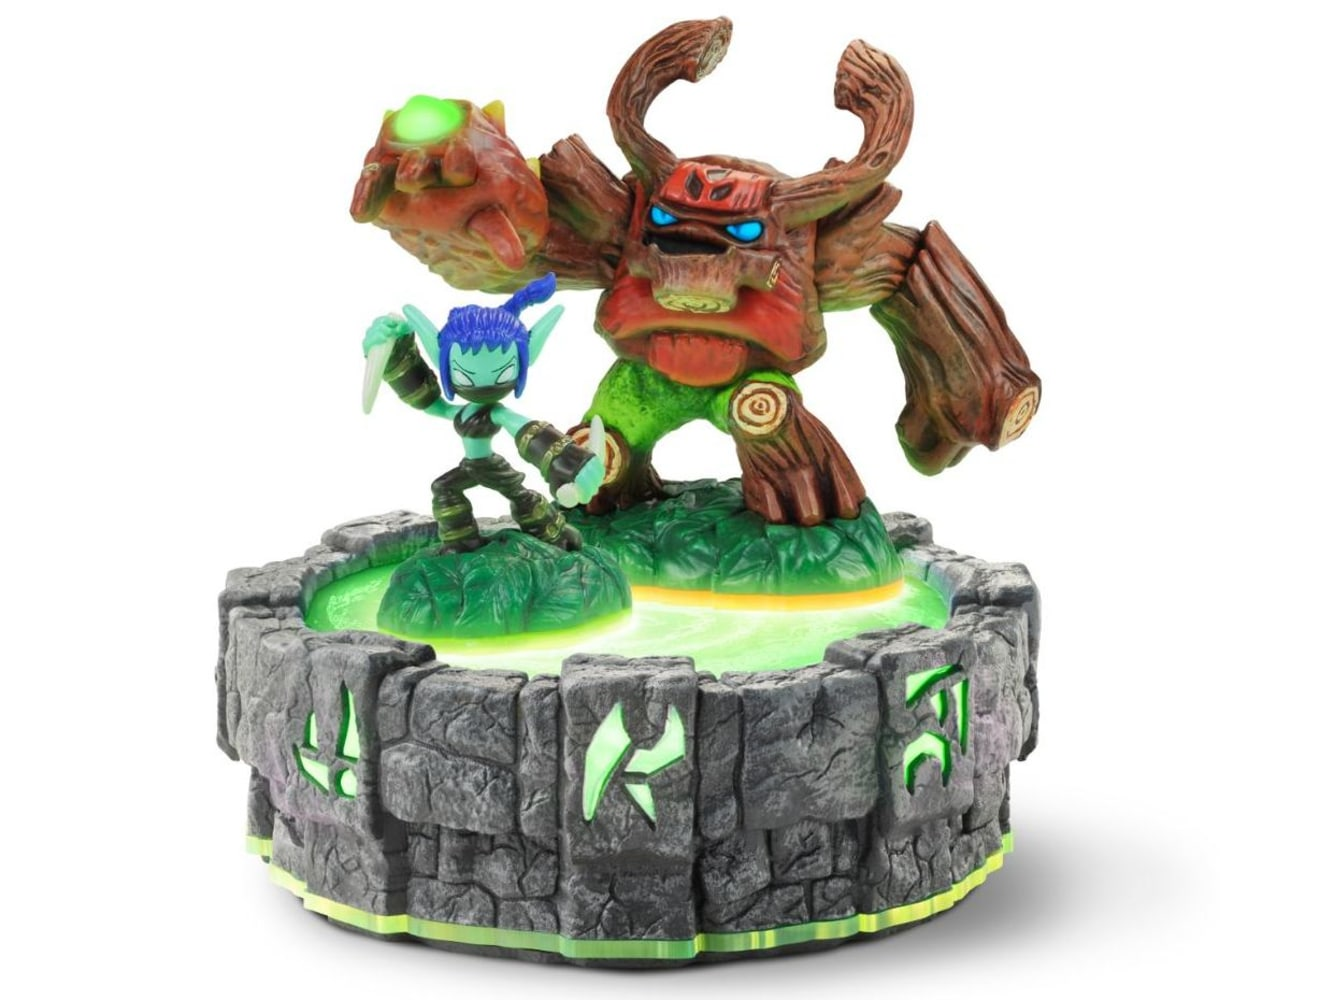 Uncategorized Are Skylanders Real robot maker brings skylanders toys to life try not hate him tree rex and stealth elf